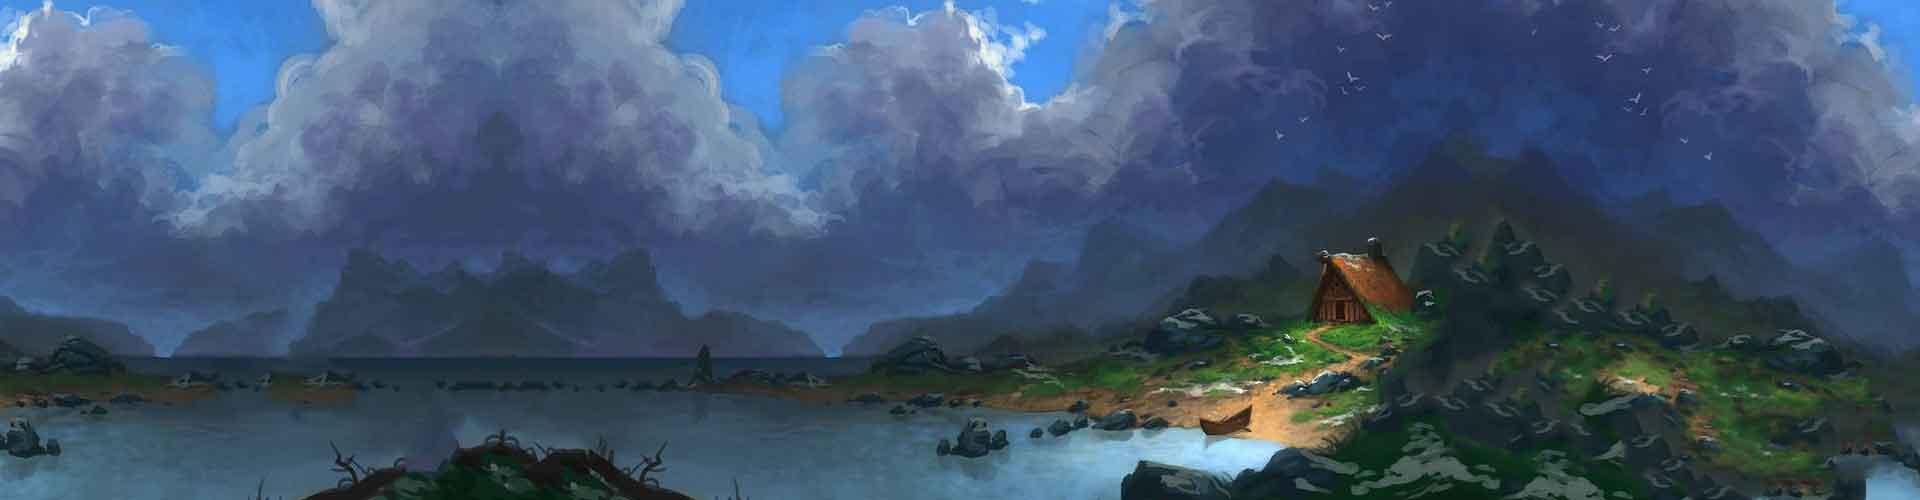 Digital painting 06